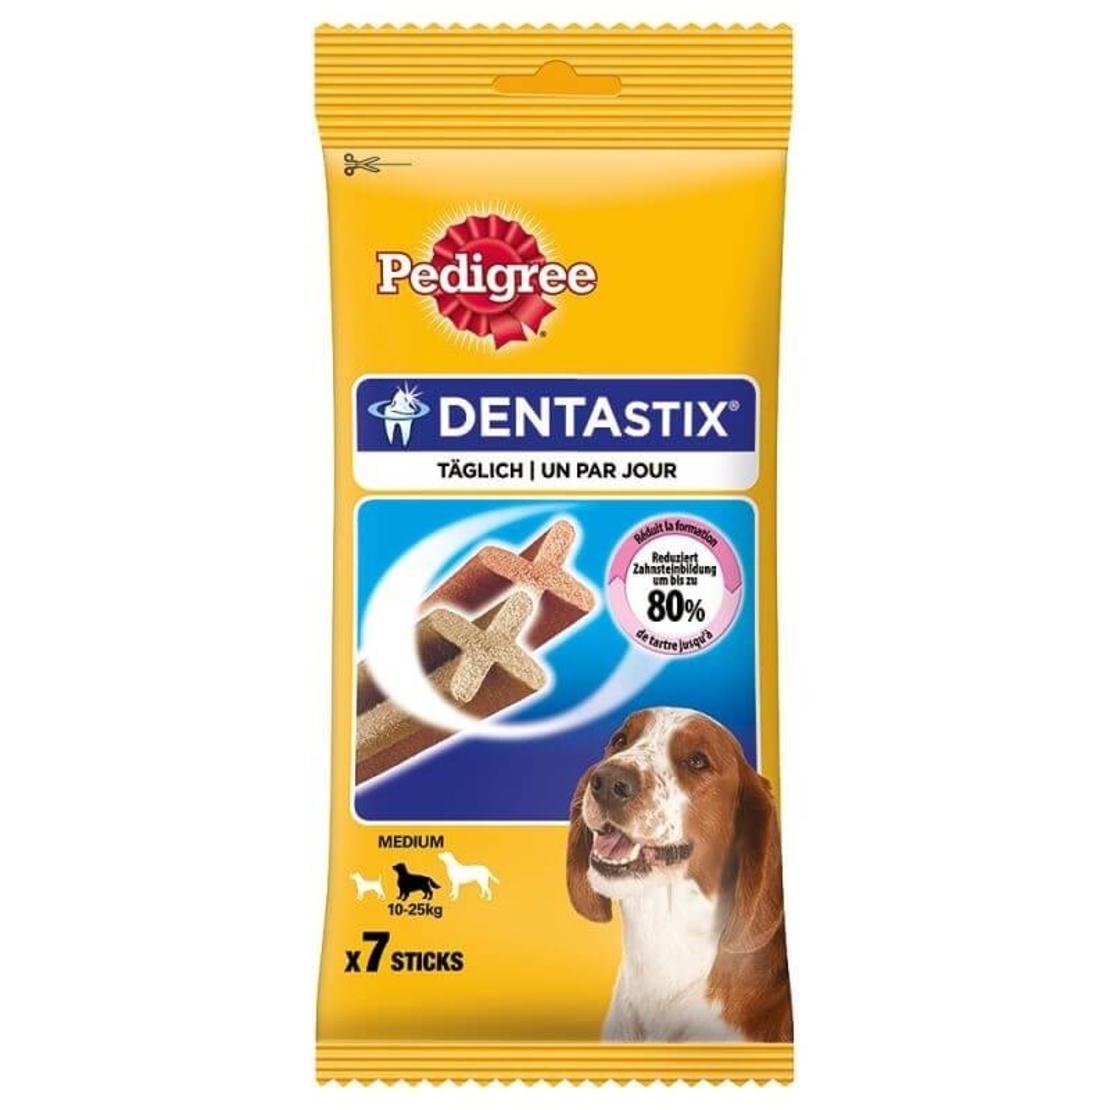 Pedigree DENTASTIX פדיגרי דנטה סטיקס - חטיף דנטלי לכלב לשימוש יומיומי